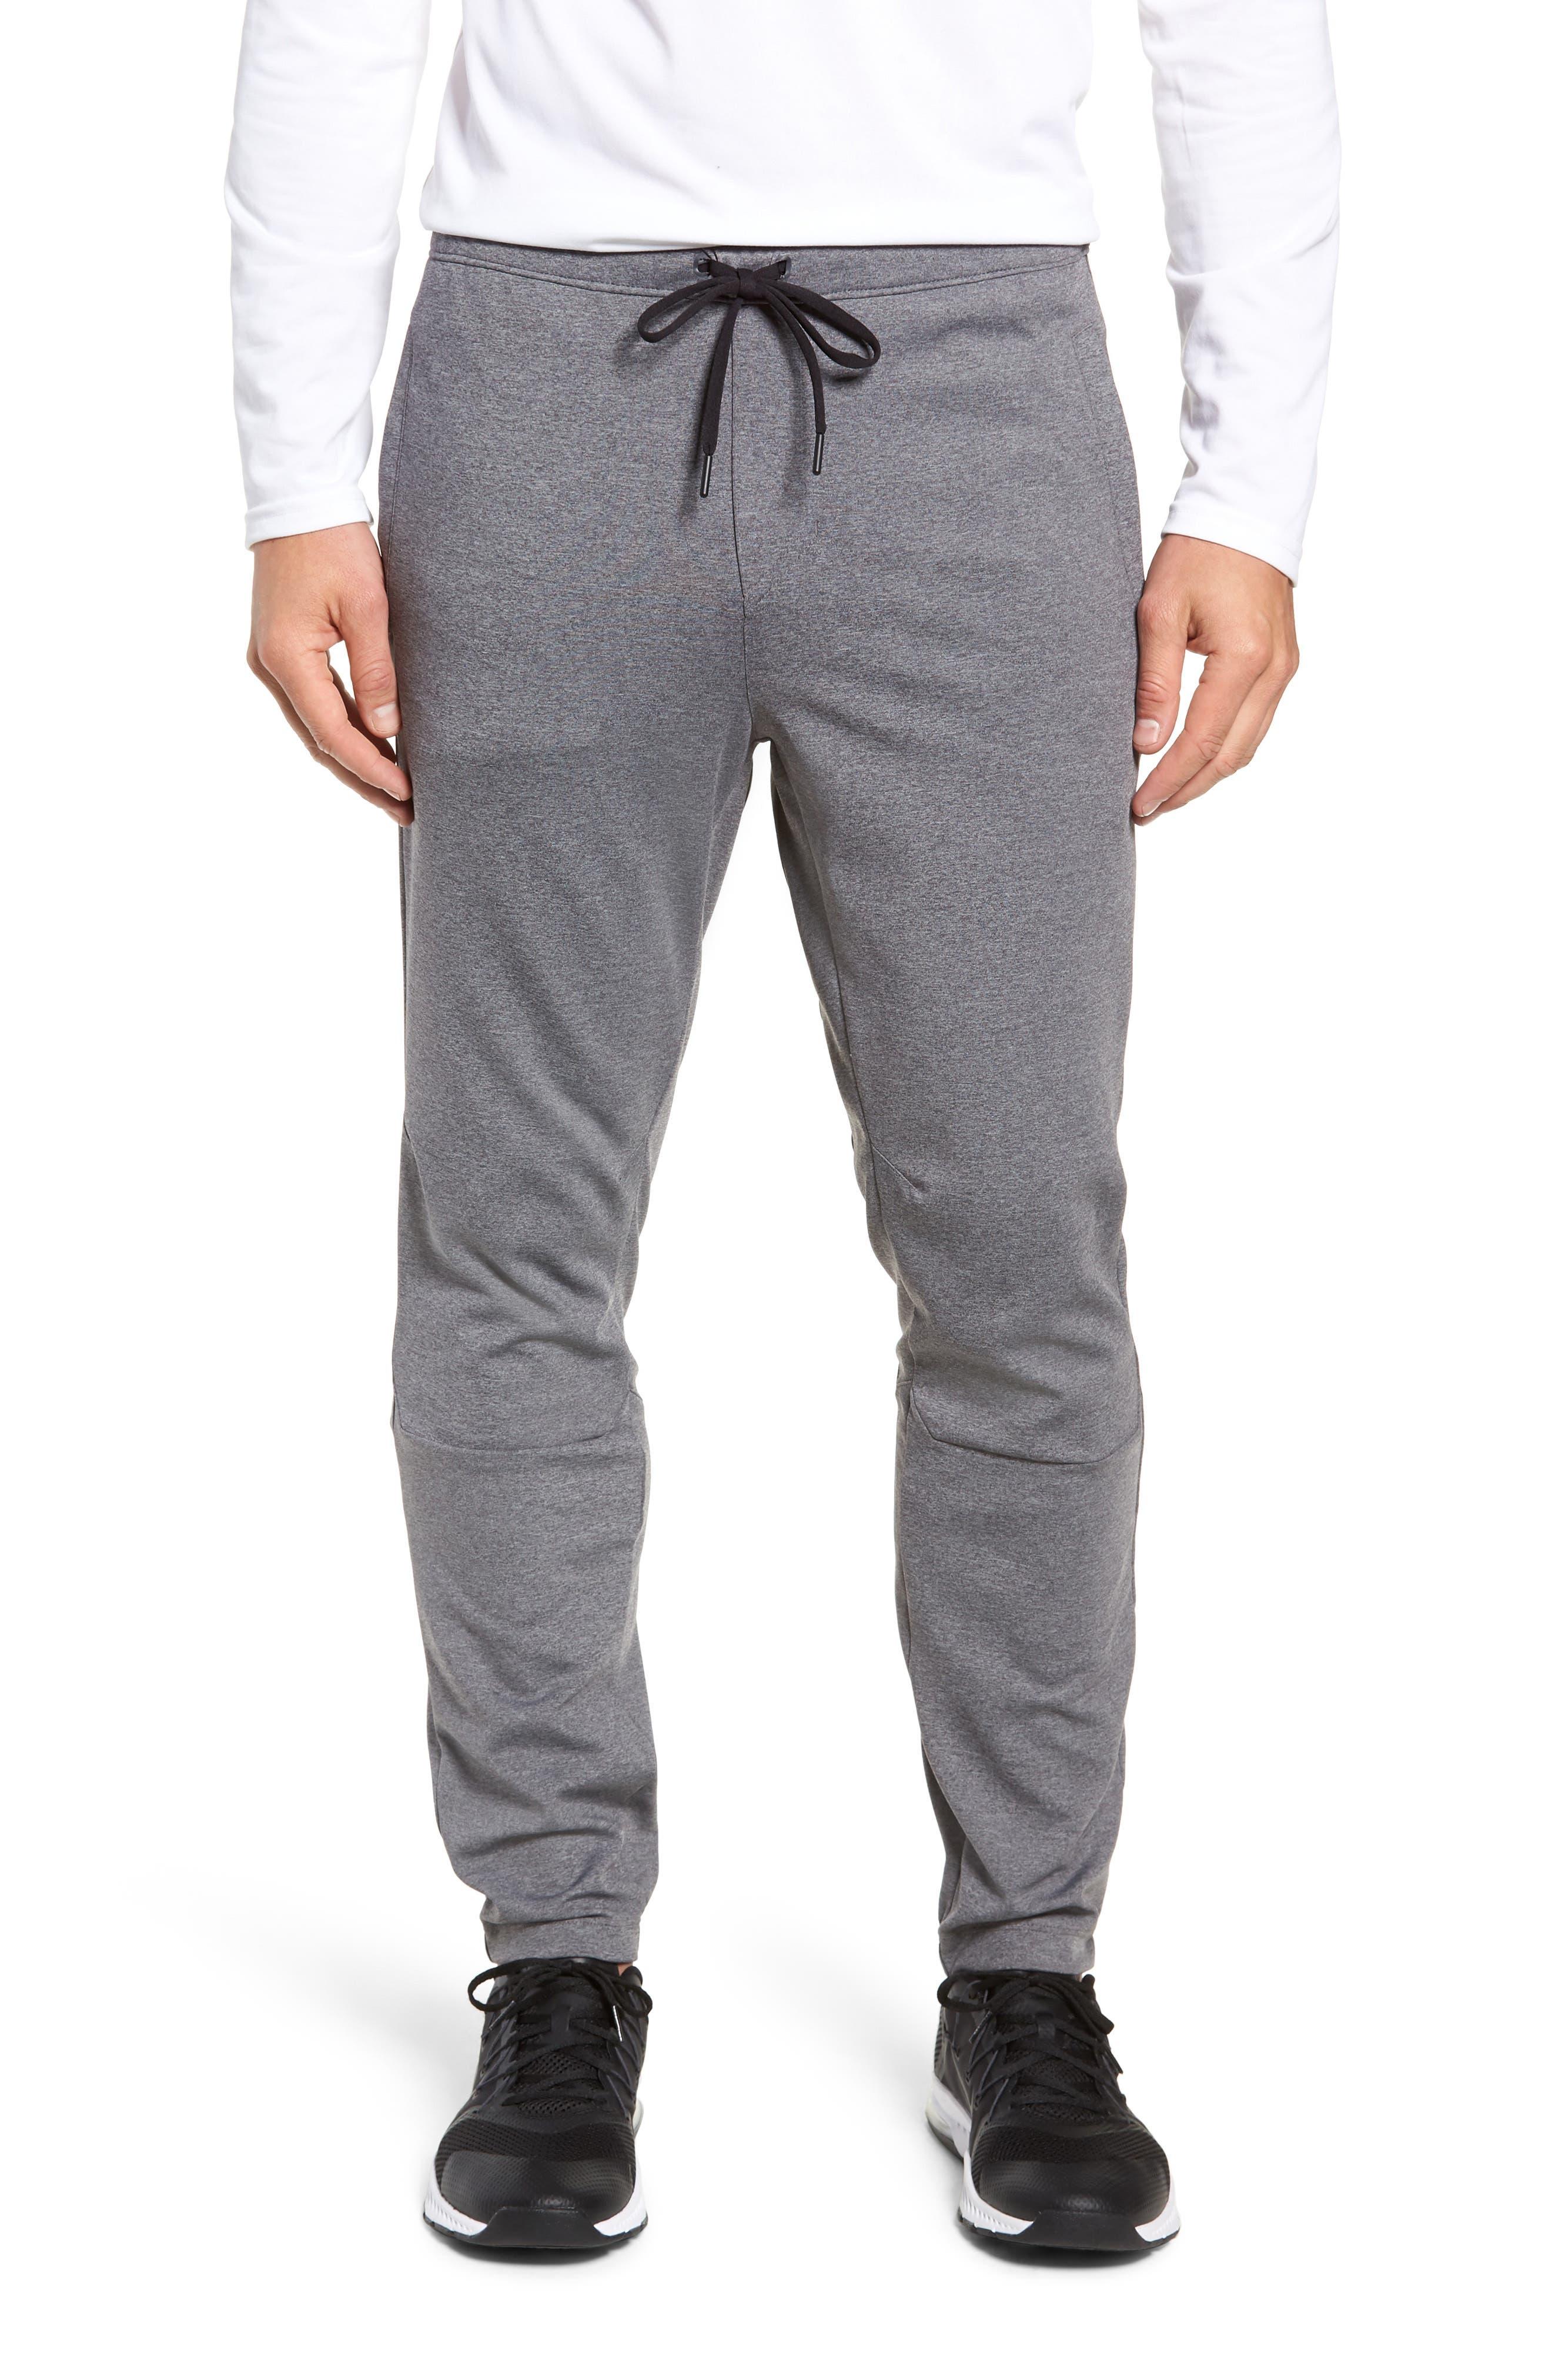 Rhone Tactel Nylon Sweatpants, Grey